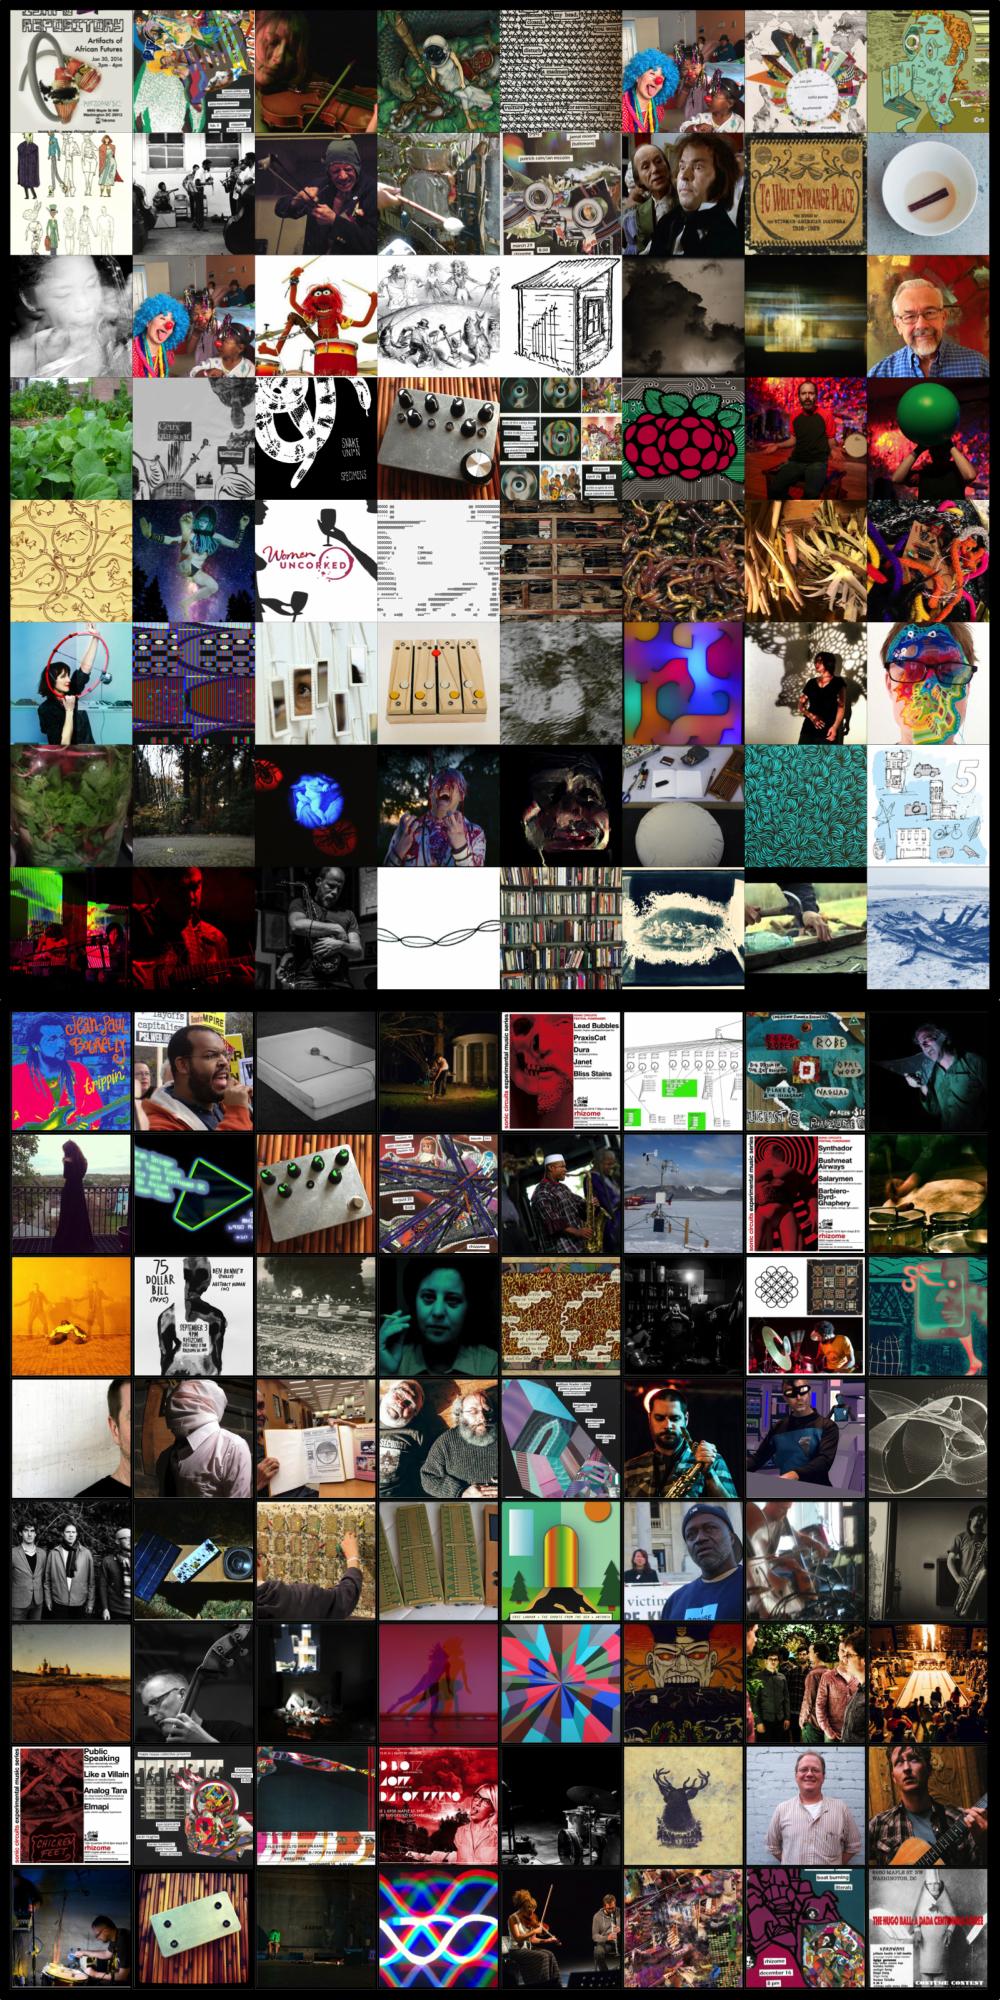 combine_imagesvert.jpg